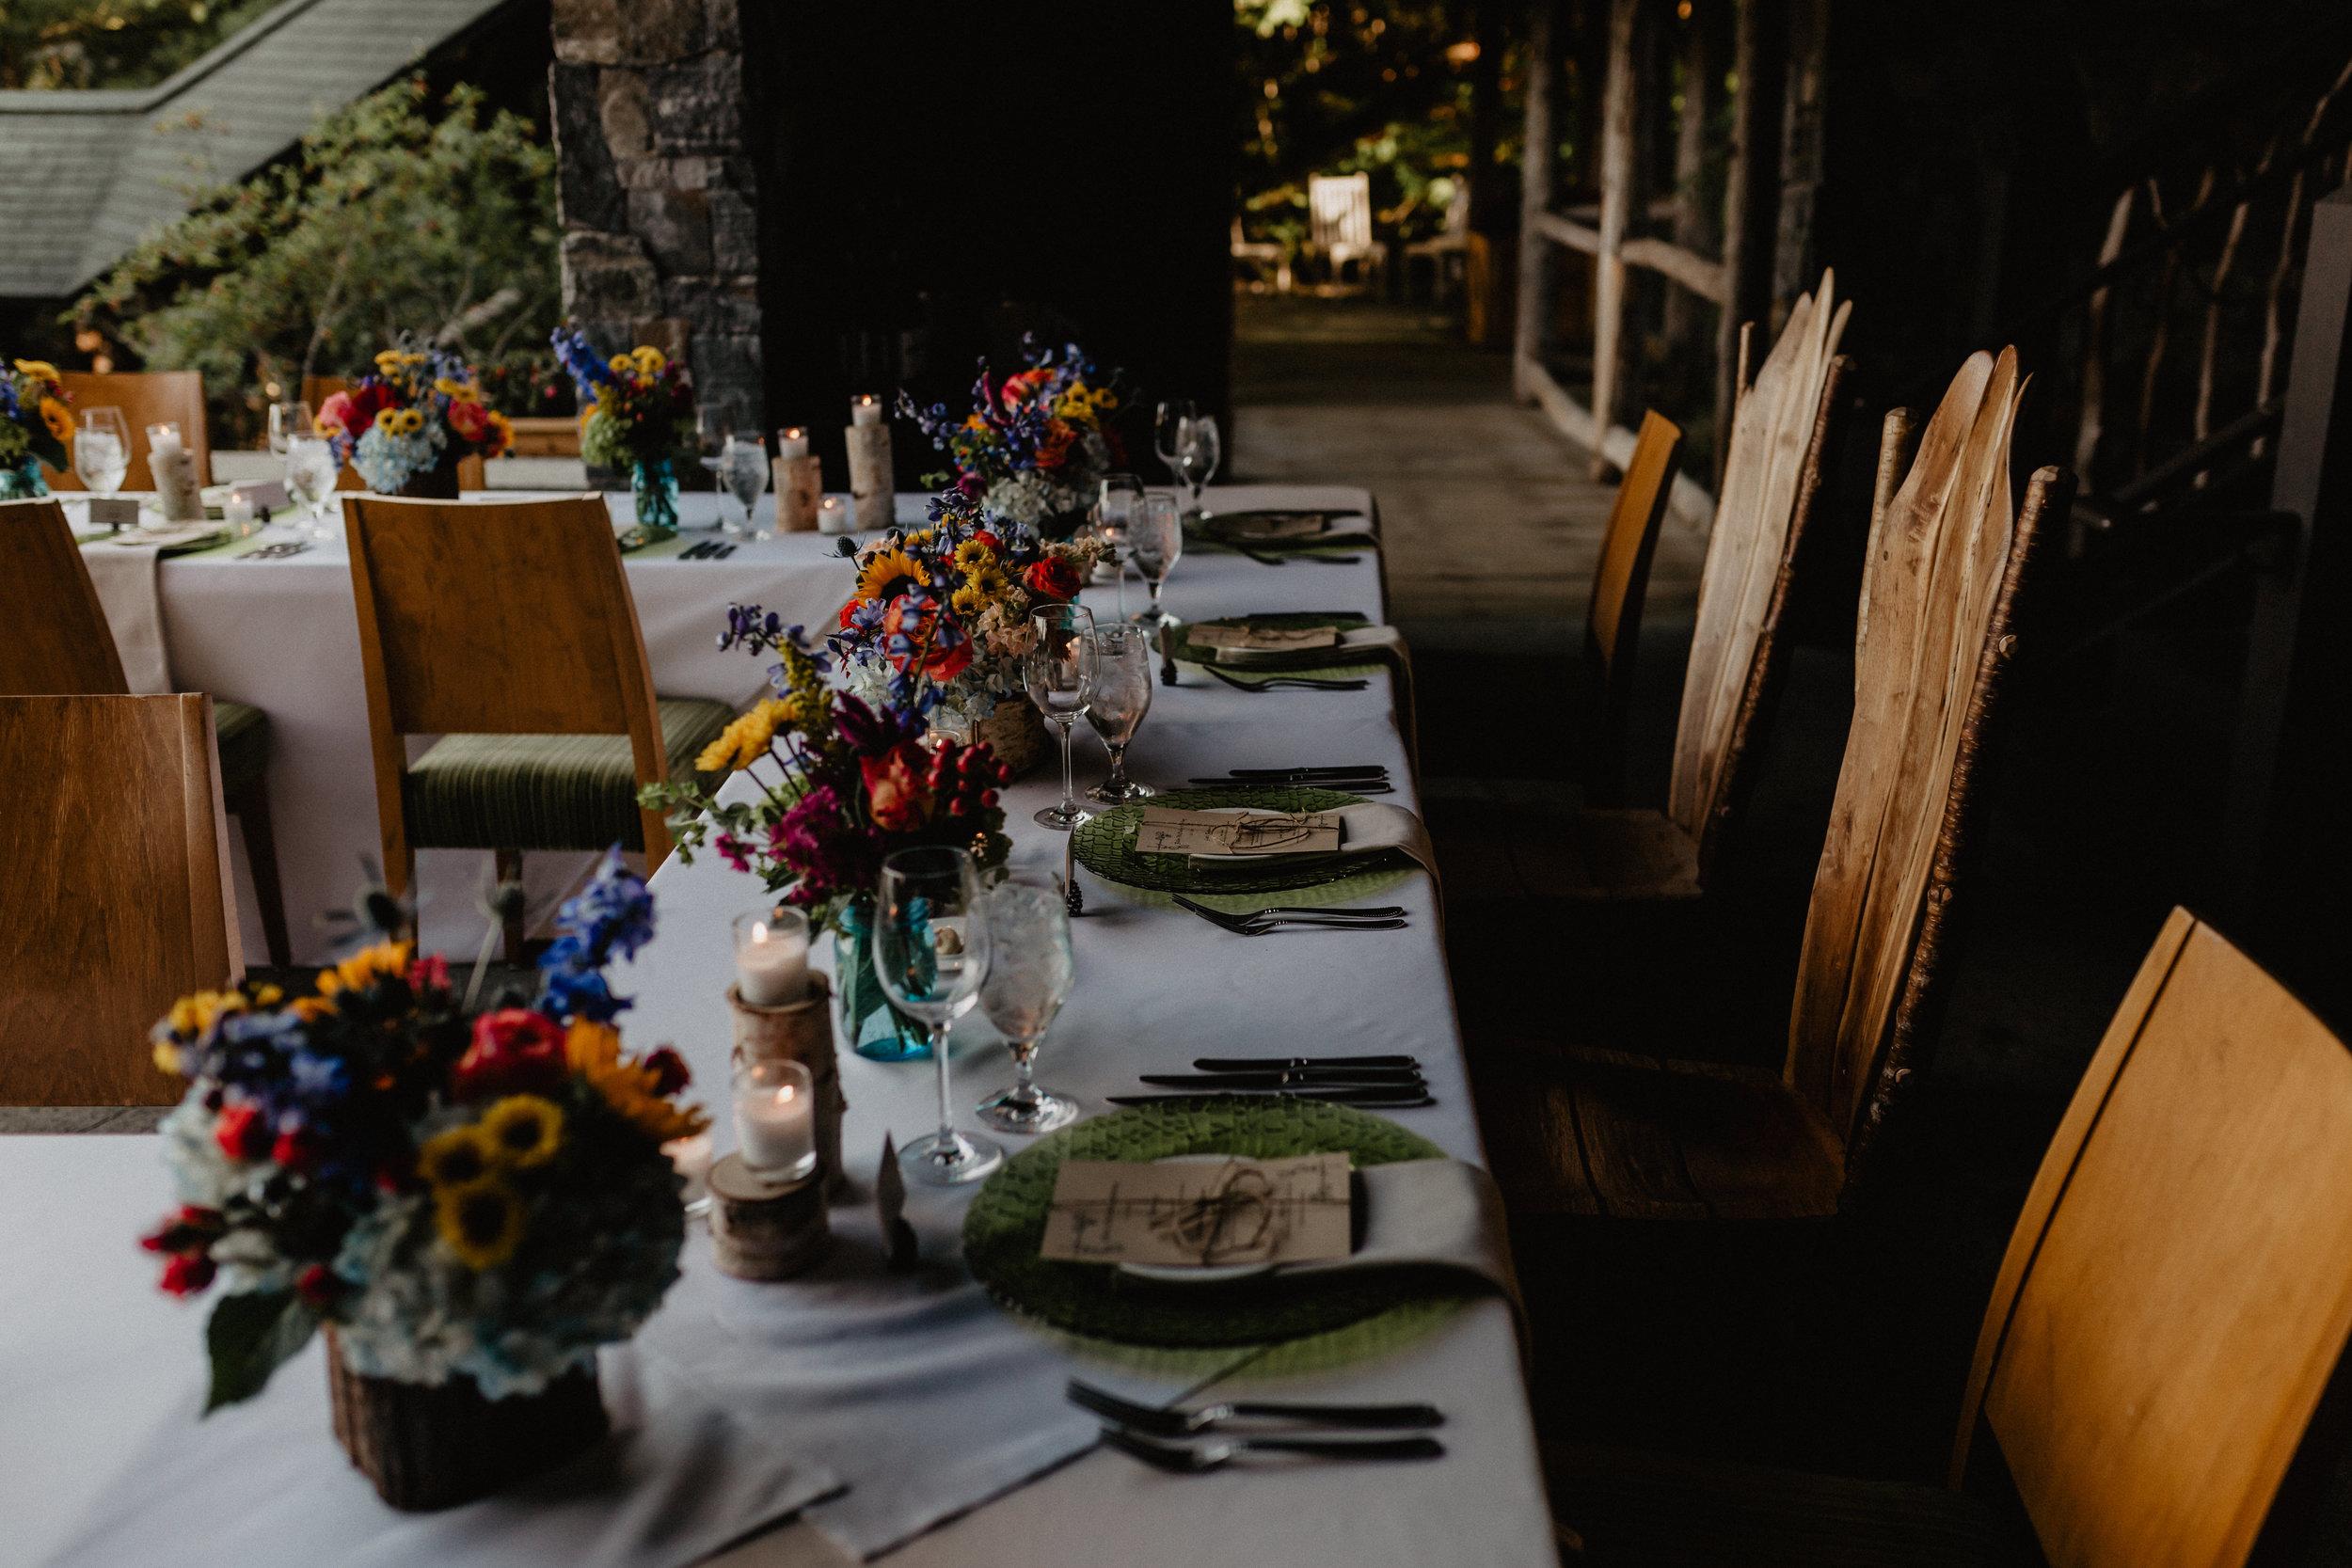 lake_placid_lodge_wedding_051.jpg